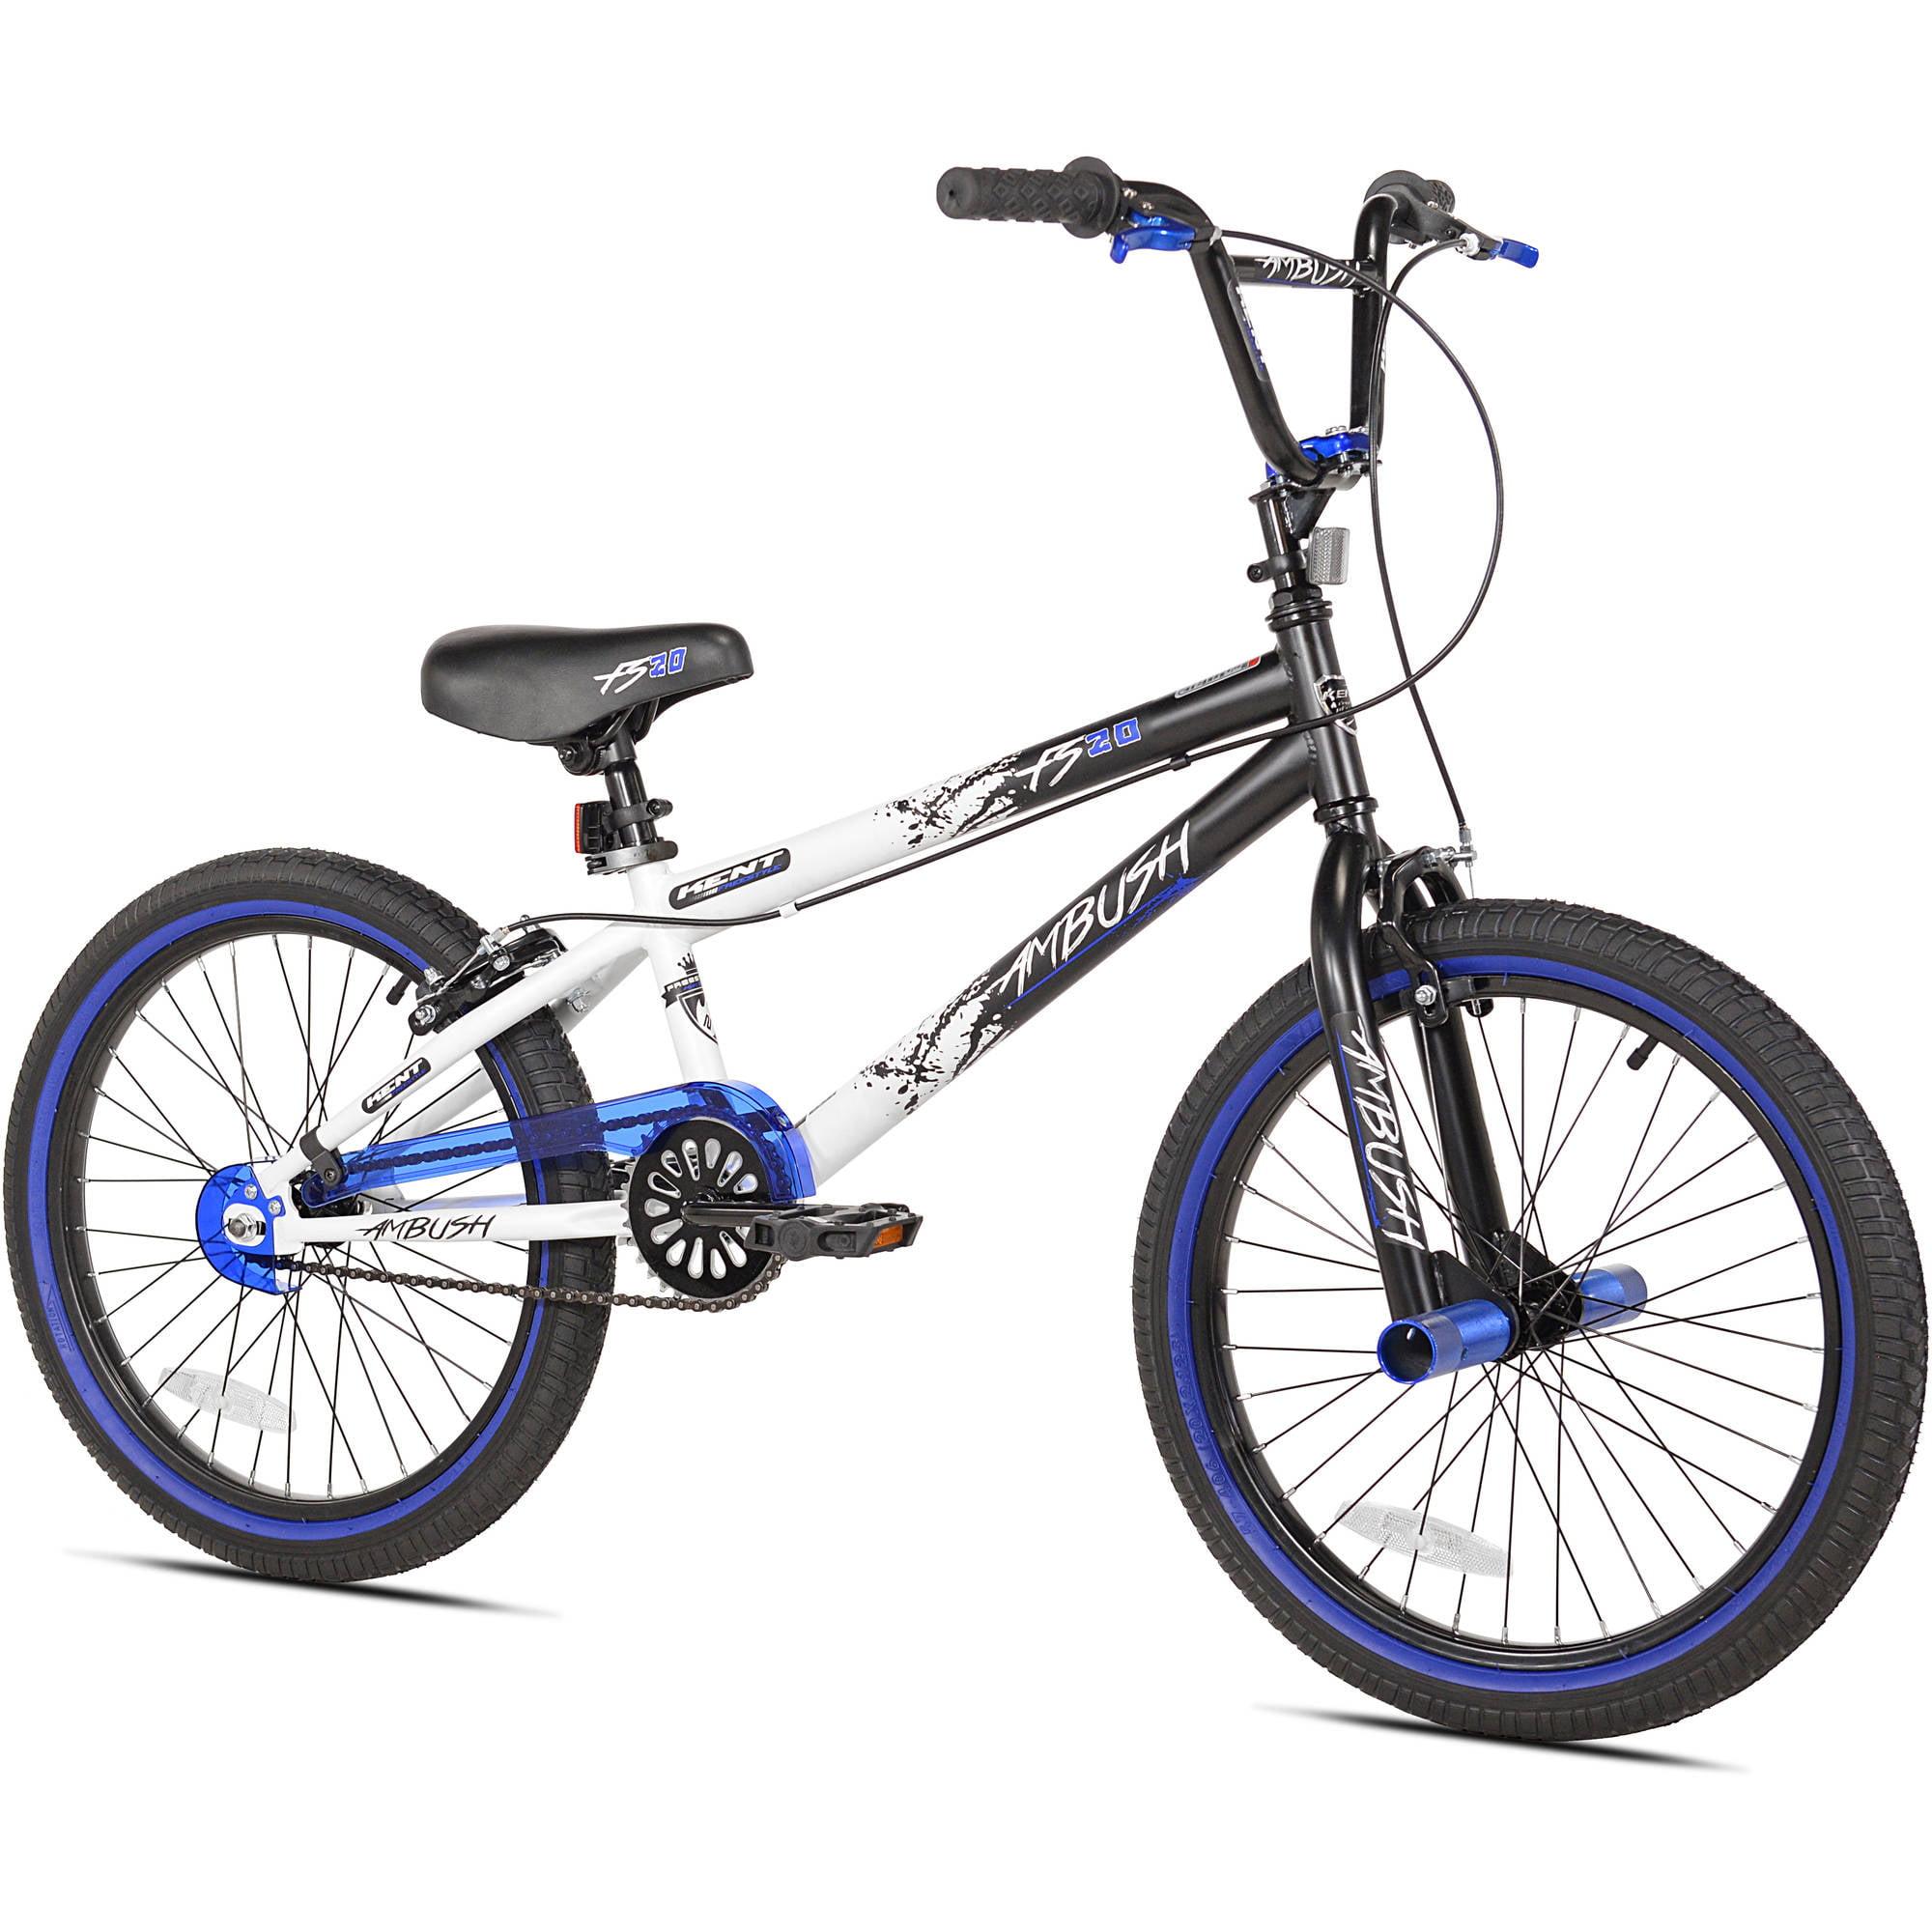 "Kent 20"" Boys', Ambush BMX Bike, Blue, For Ages 8-12"